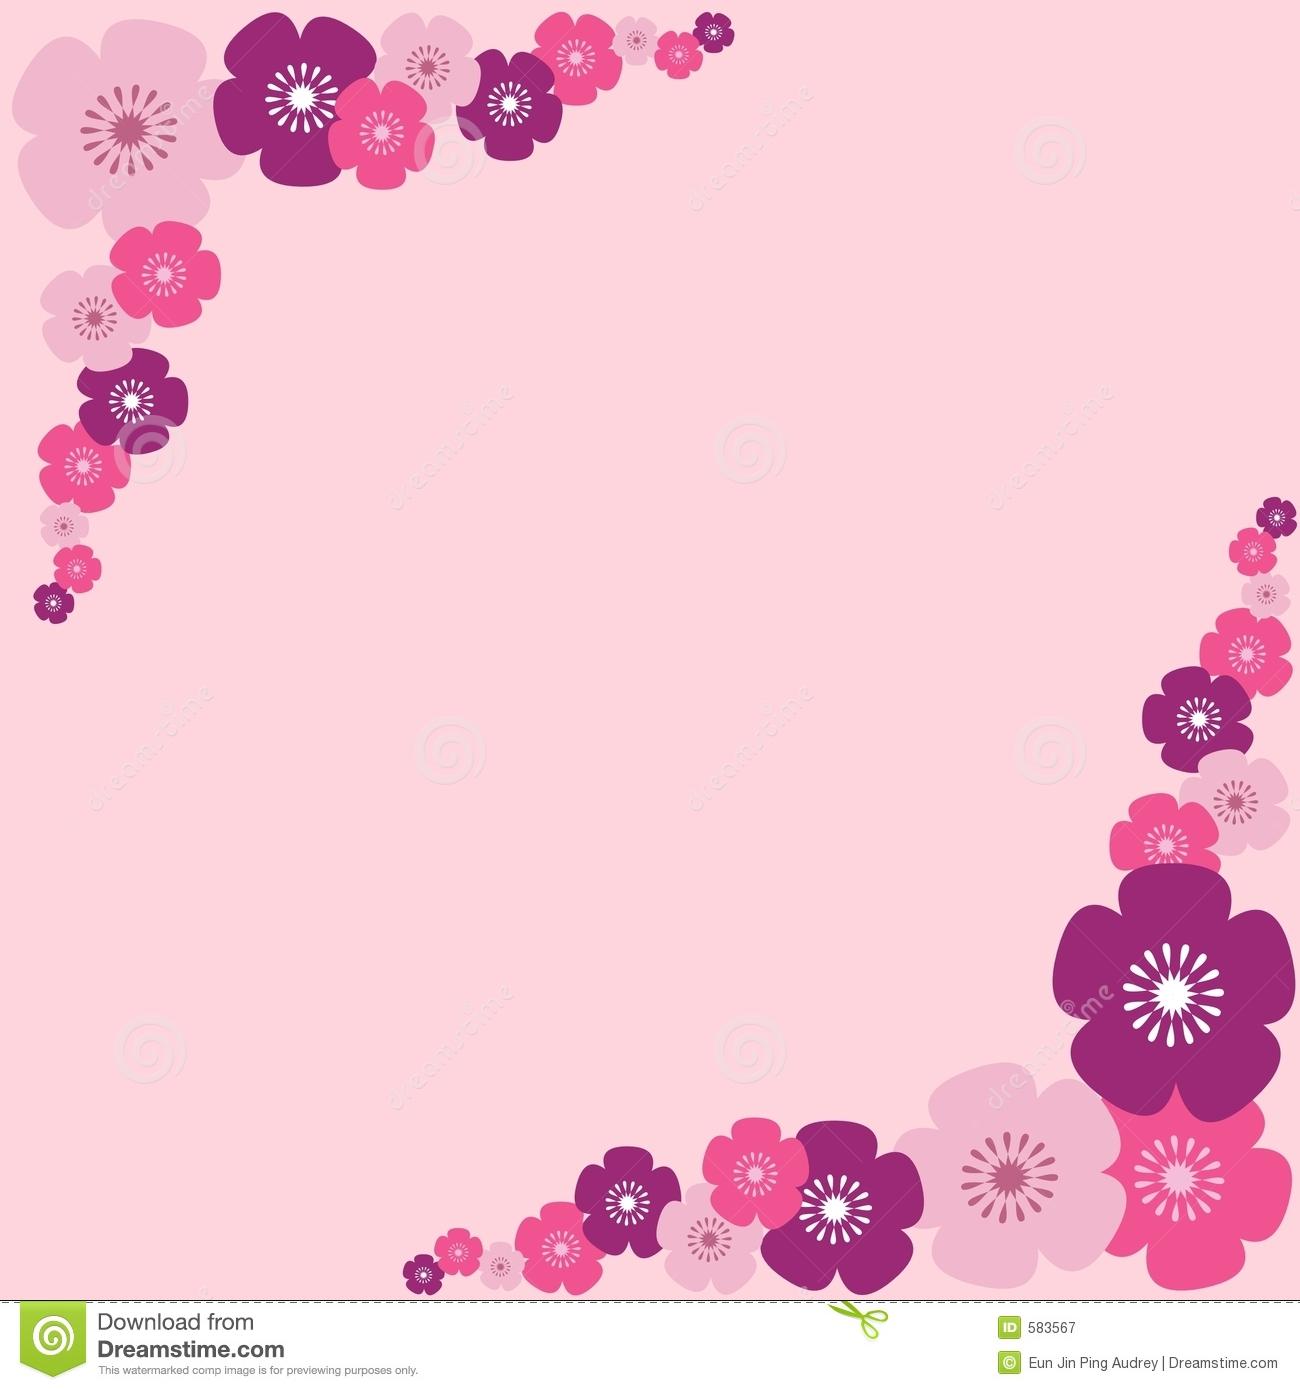 Flower border download image royalty free library Pink Flowers Border Stock Images - Image: 23914514 image royalty free library